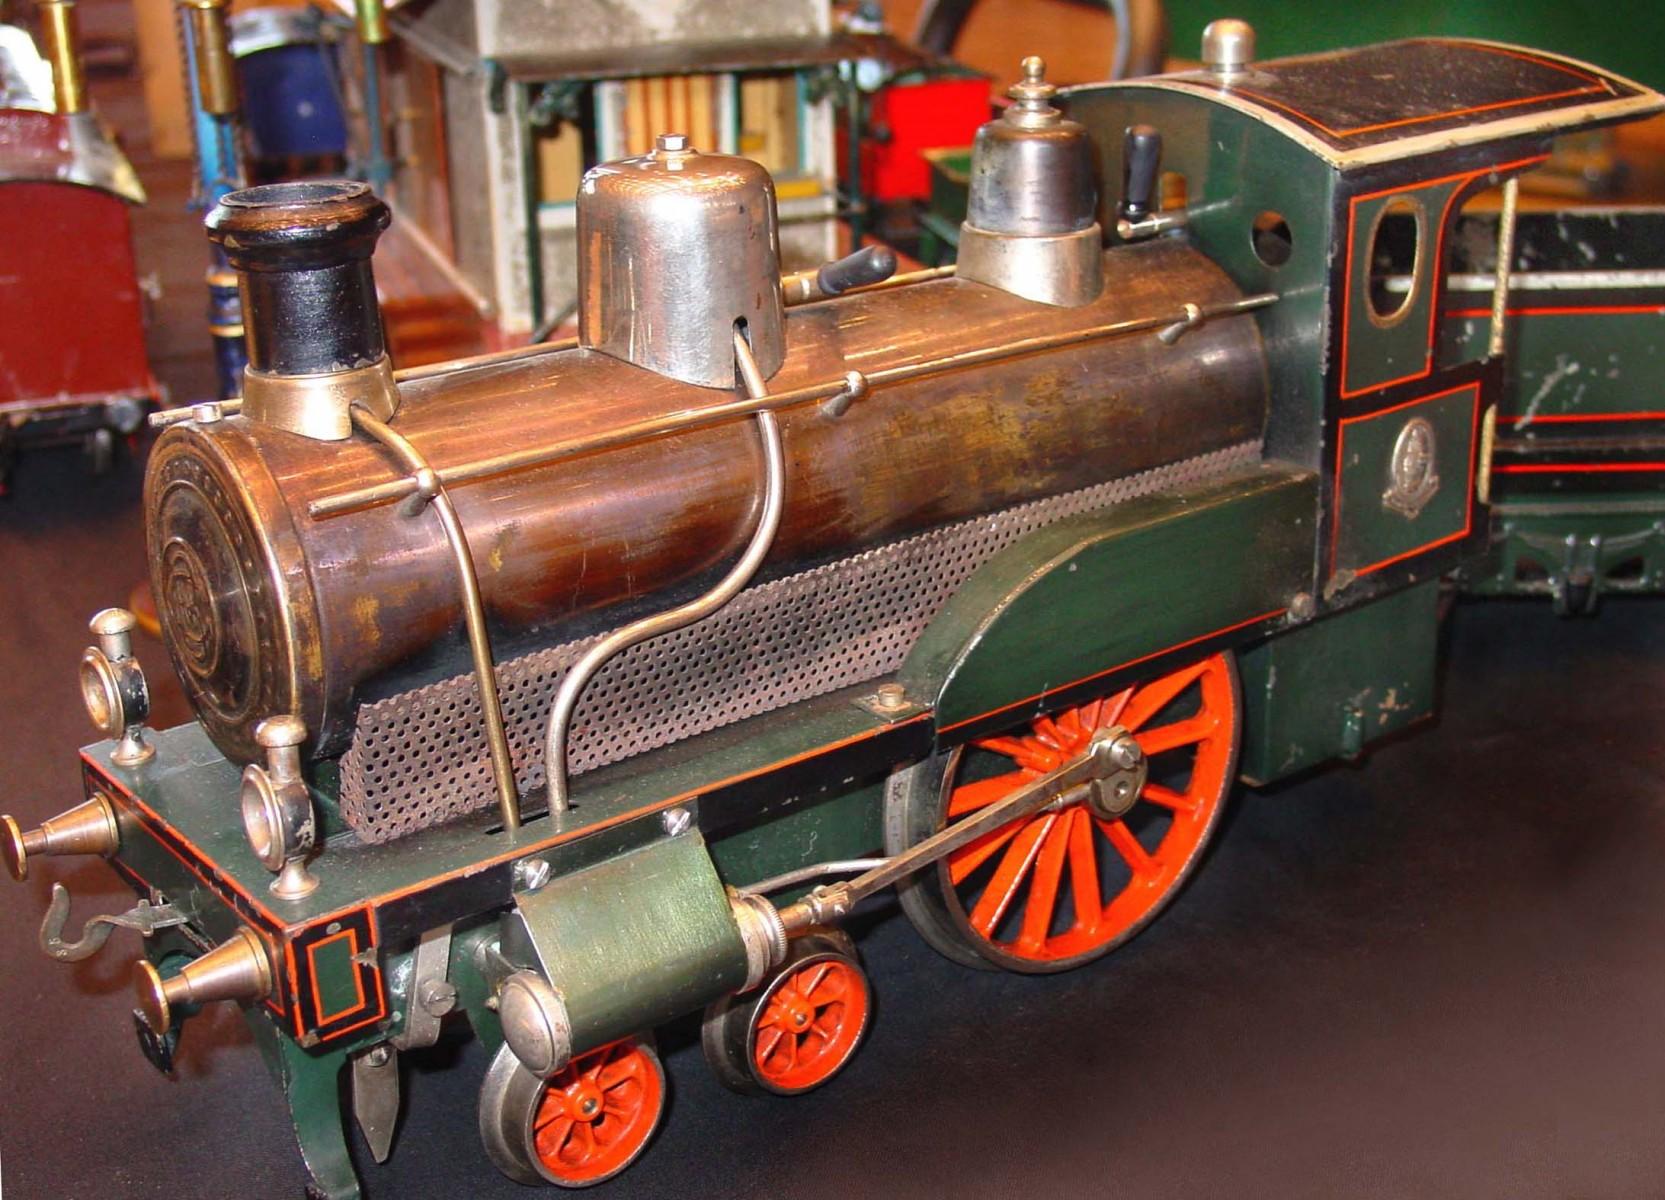 Pressebild-Theurer-Dampflokomotive-farbig